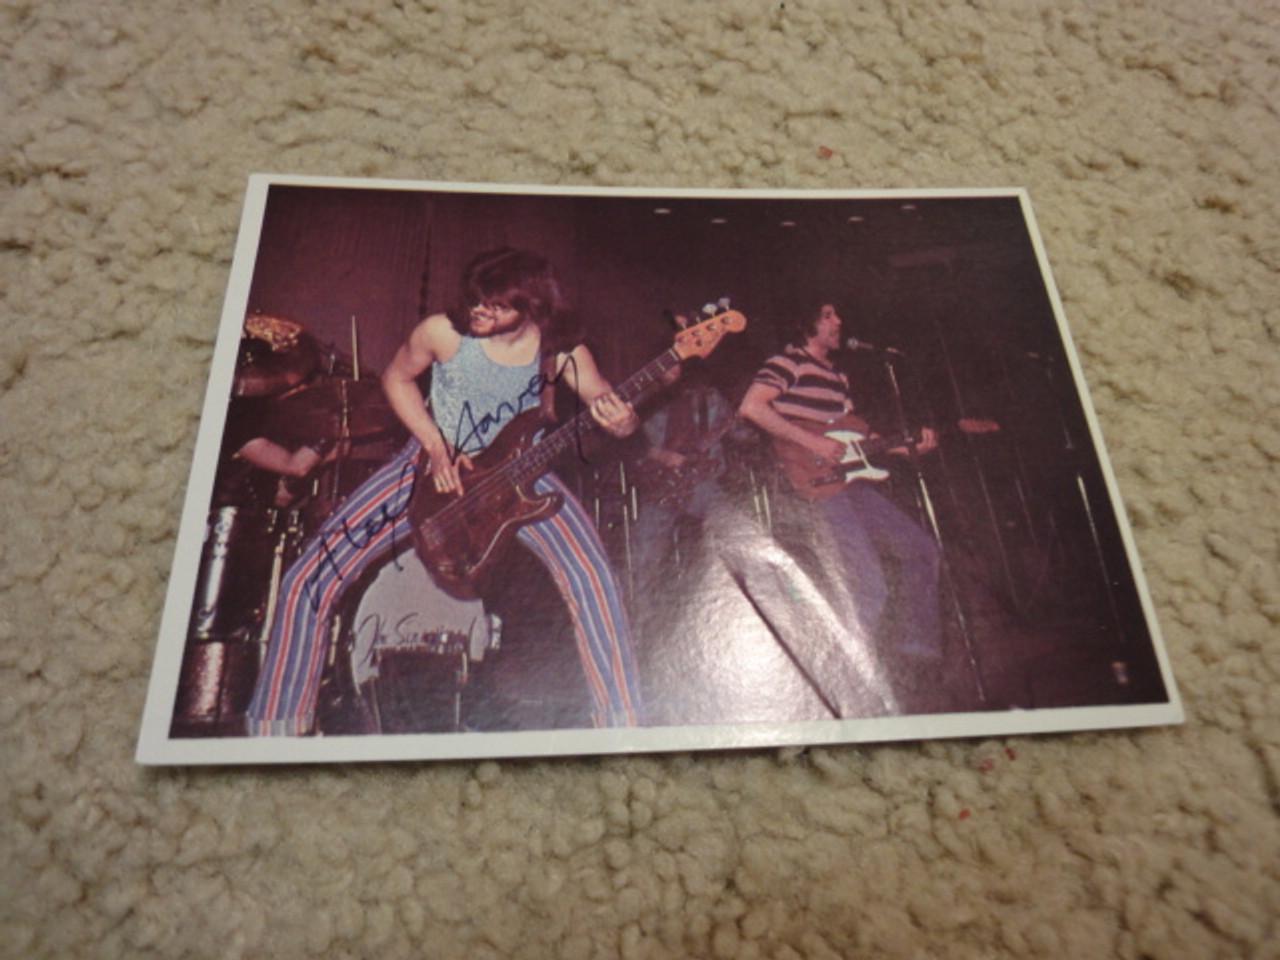 Harvey, Alex Color Photo Trading Card 1973 Signed Autograph Import